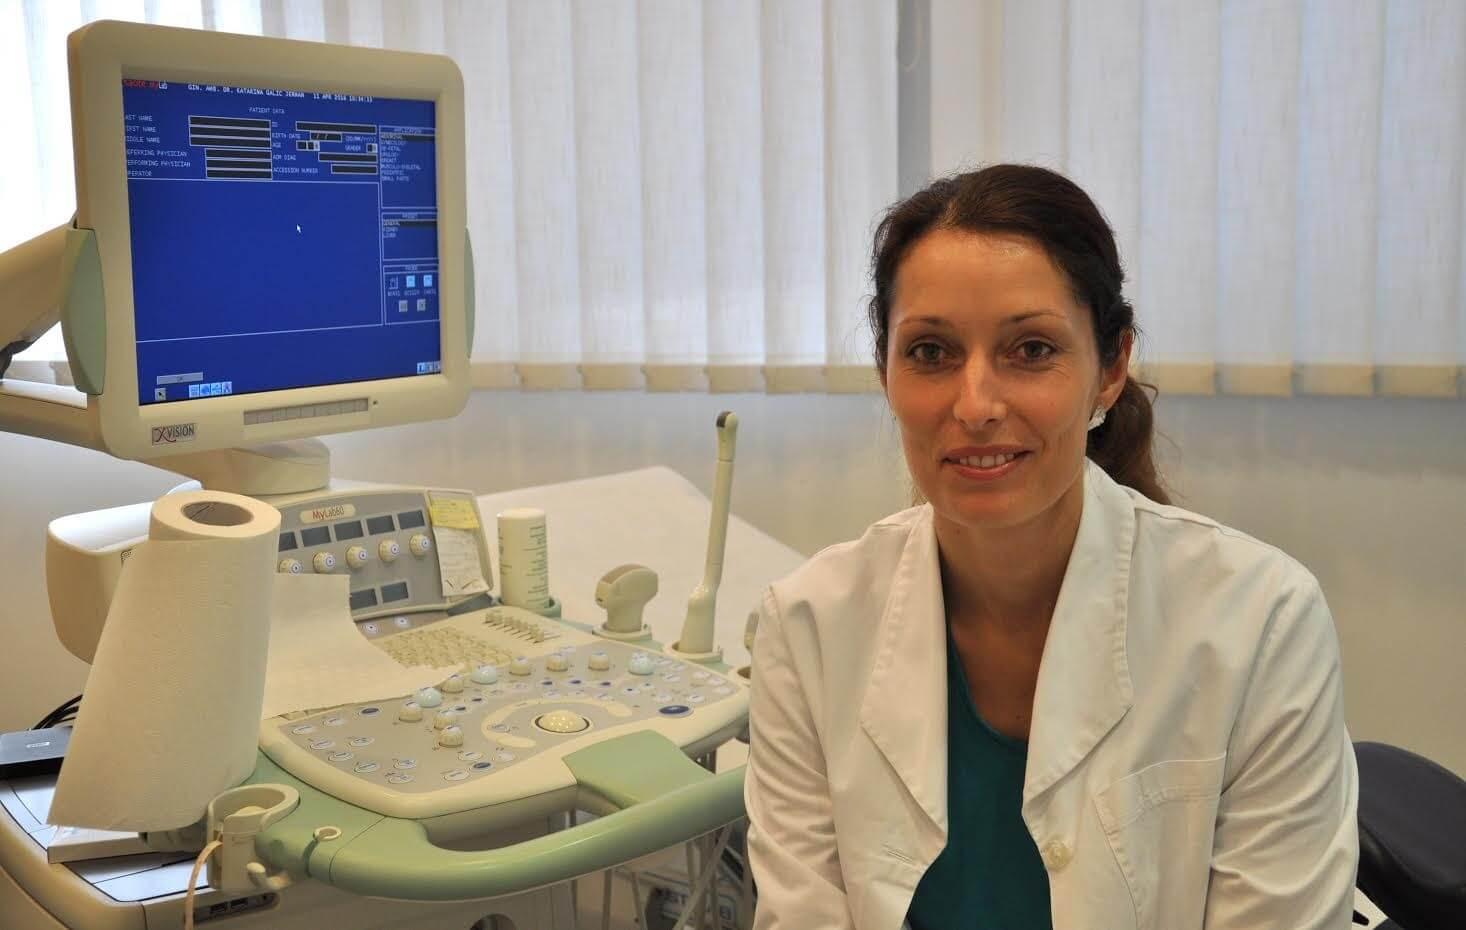 Katarina Galič Jerman, dr. med., specialistka ginekologije in porodništva